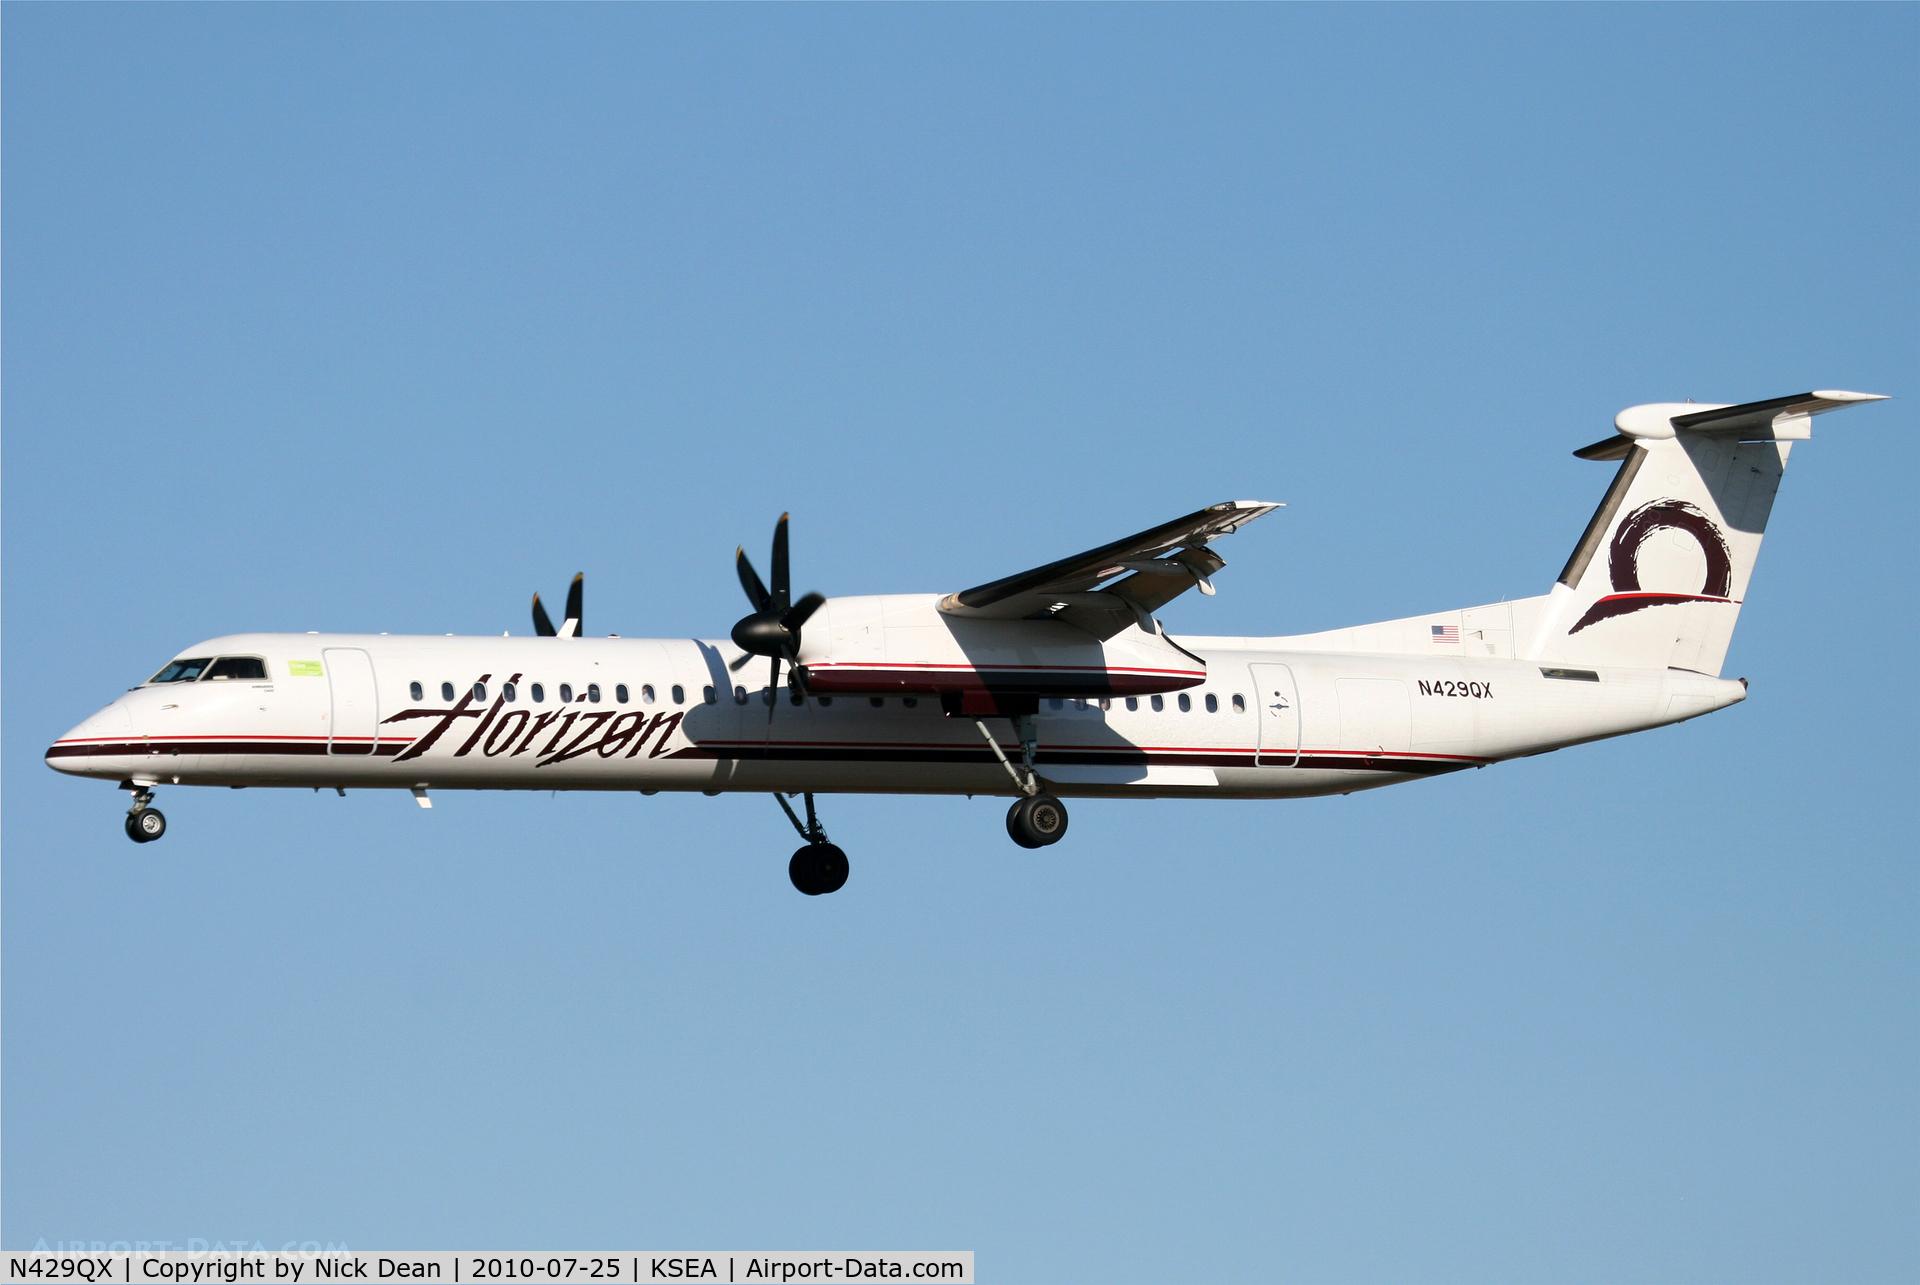 N429QX, 2007 De Havilland Canada DHC-8-402 Dash 8 C/N 4161, KSEA